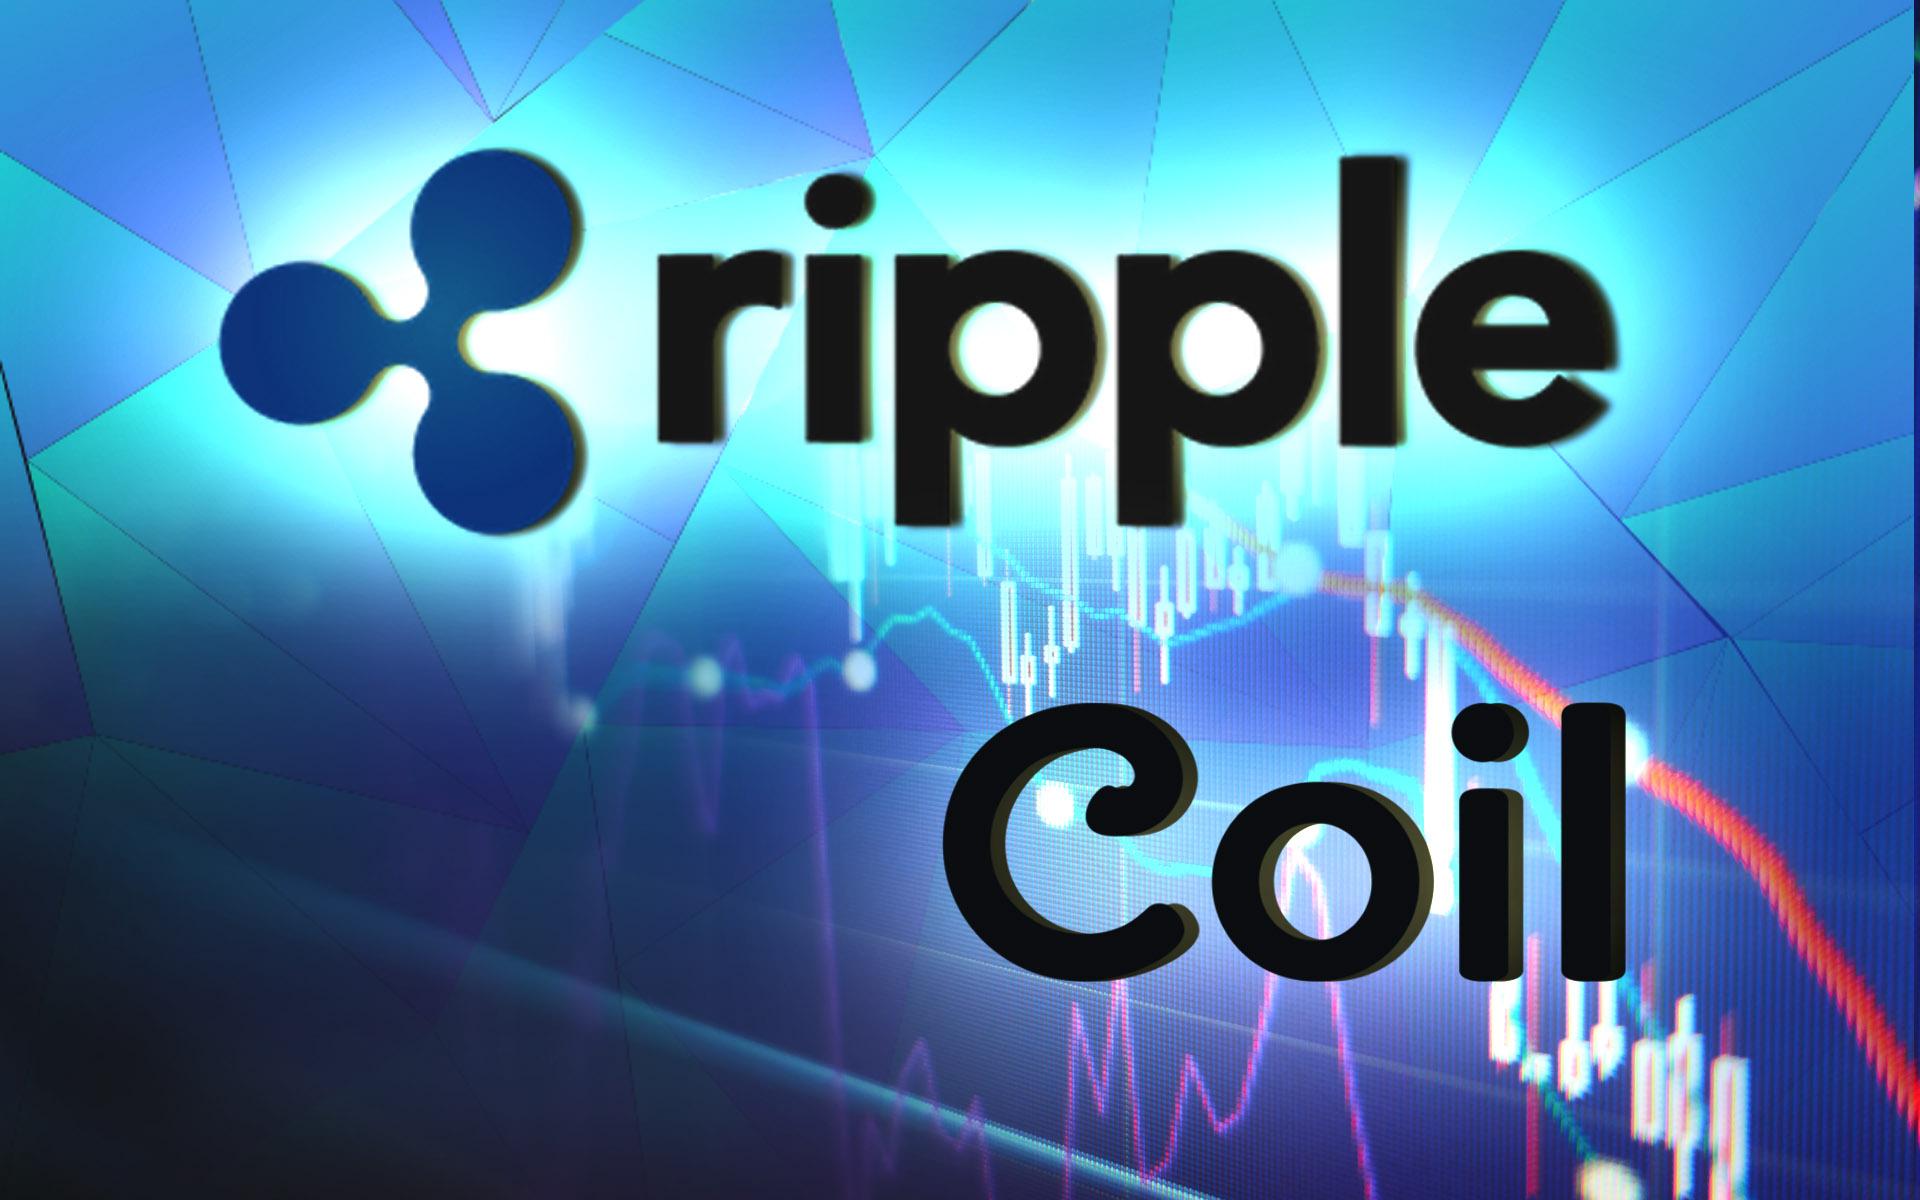 ripple coil